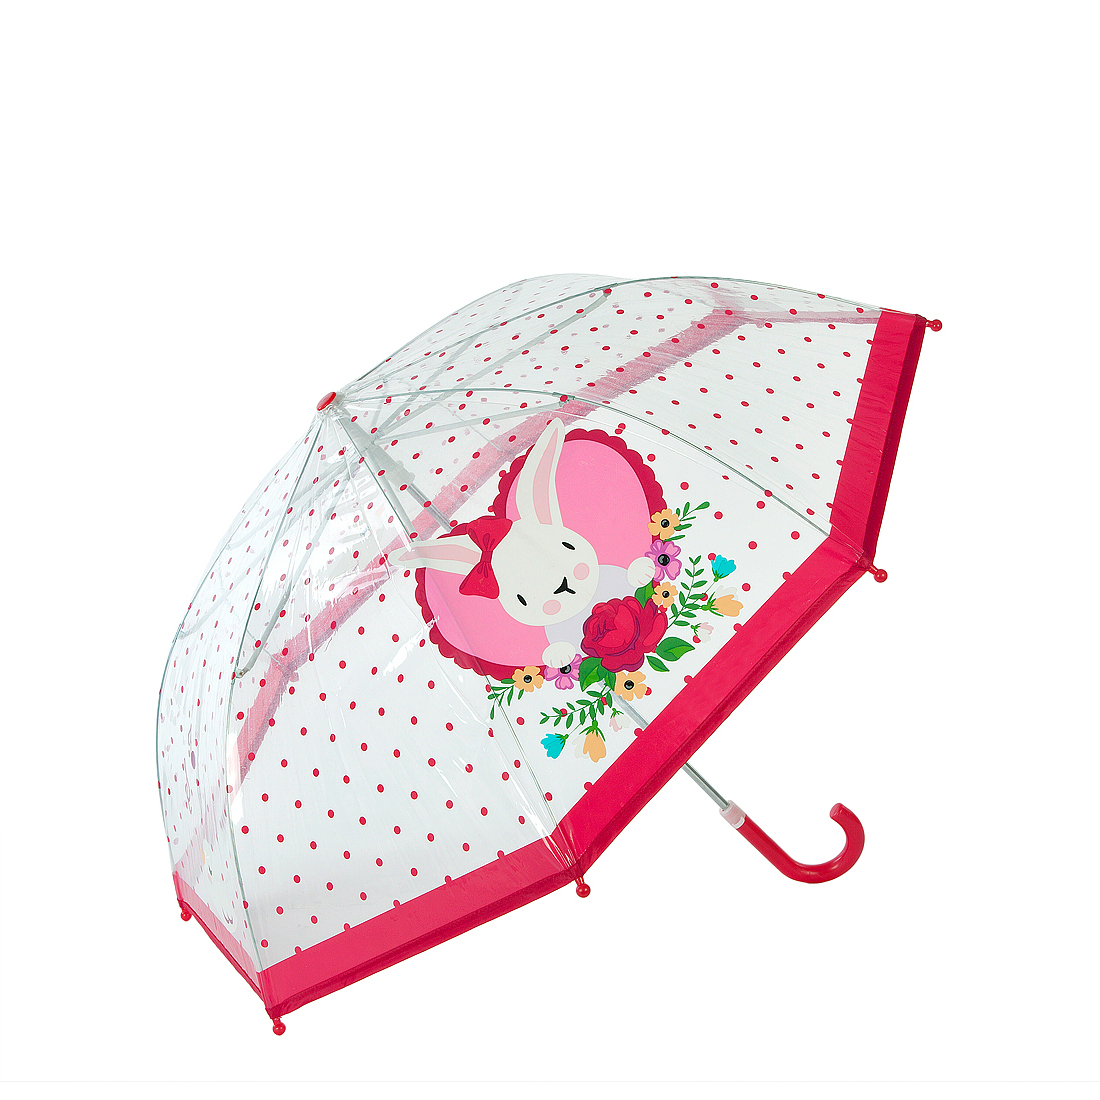 Зонты Mary Poppins Rose Bunny прозрачный 46 см зонт детский mary poppins динозаврик 46 см